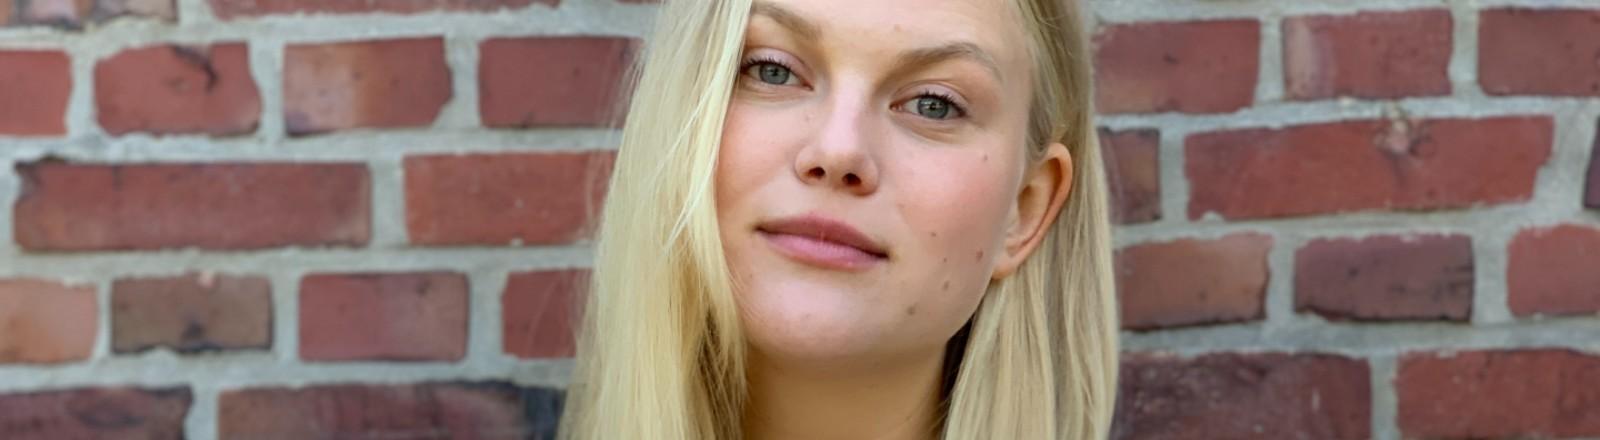 Topmodel Anne-Sophie Monrad